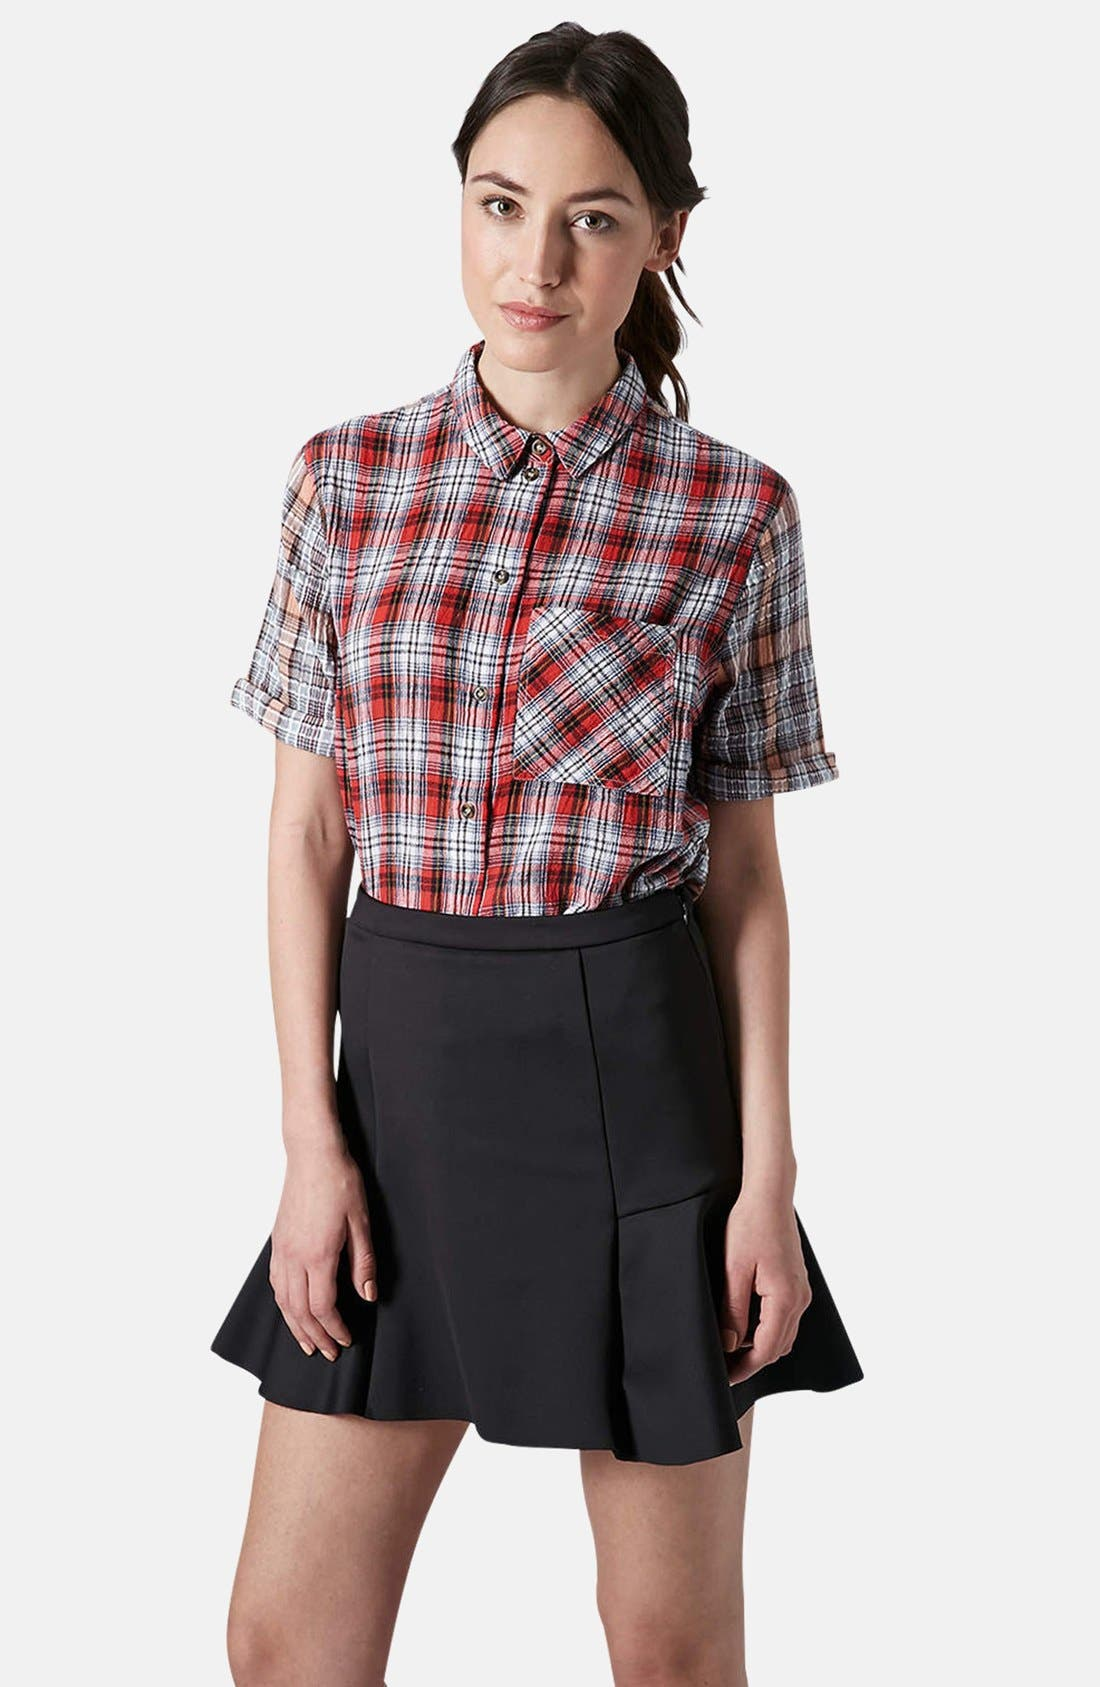 Alternate Image 1 Selected - Topshop Check Seersucker Shirt